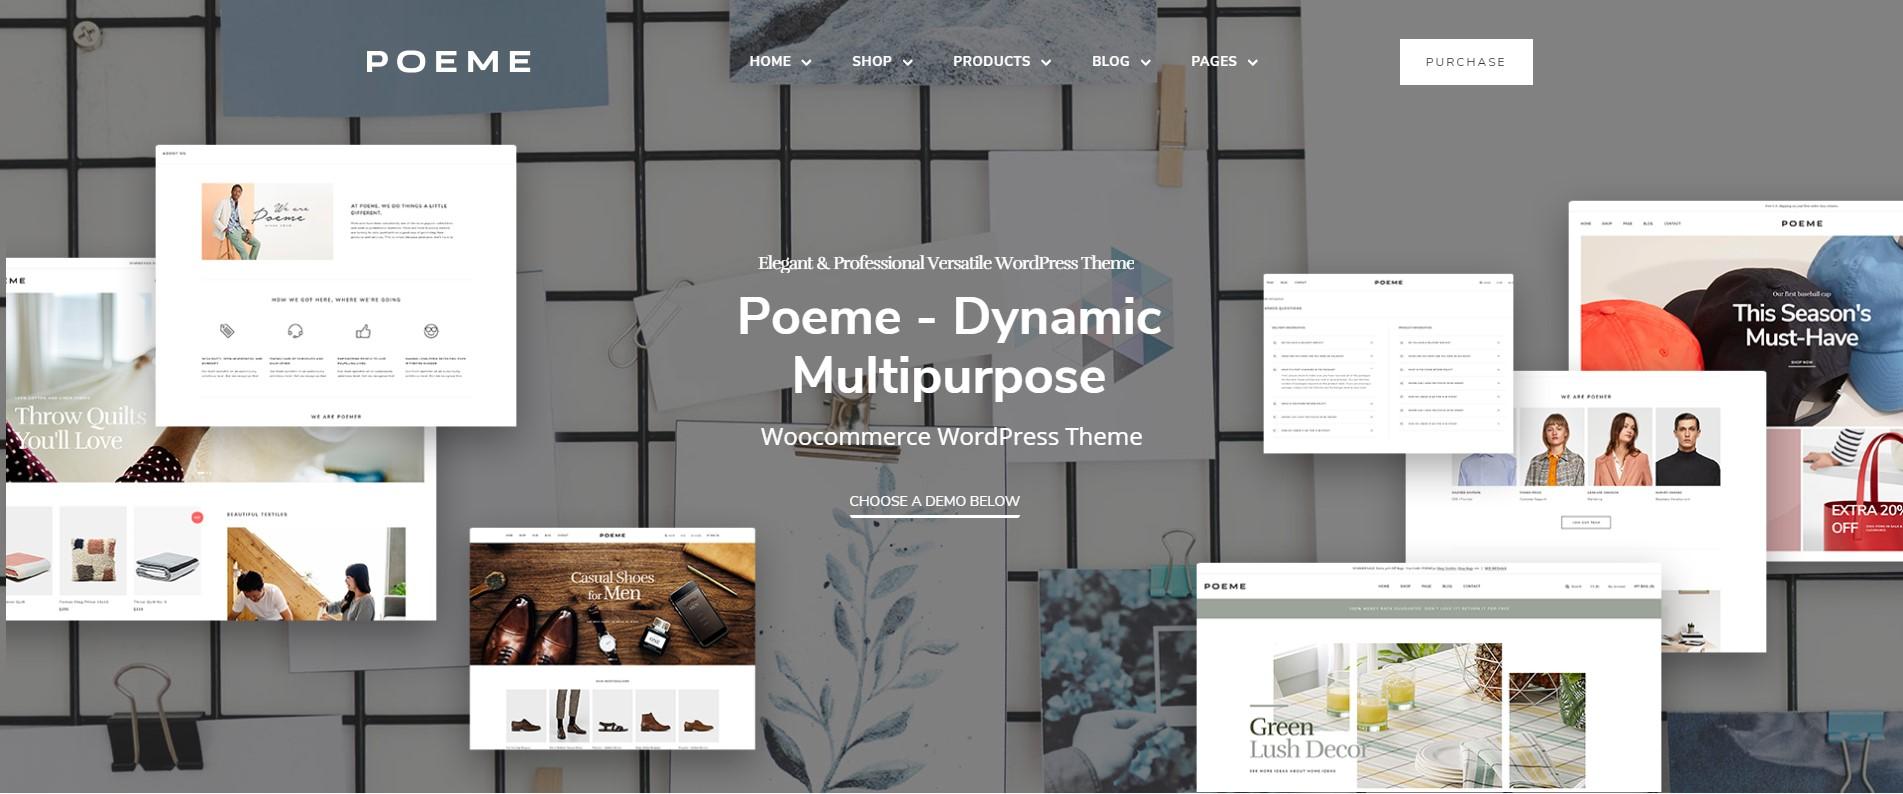 Poeme - Multipurpose WooCommerce Theme